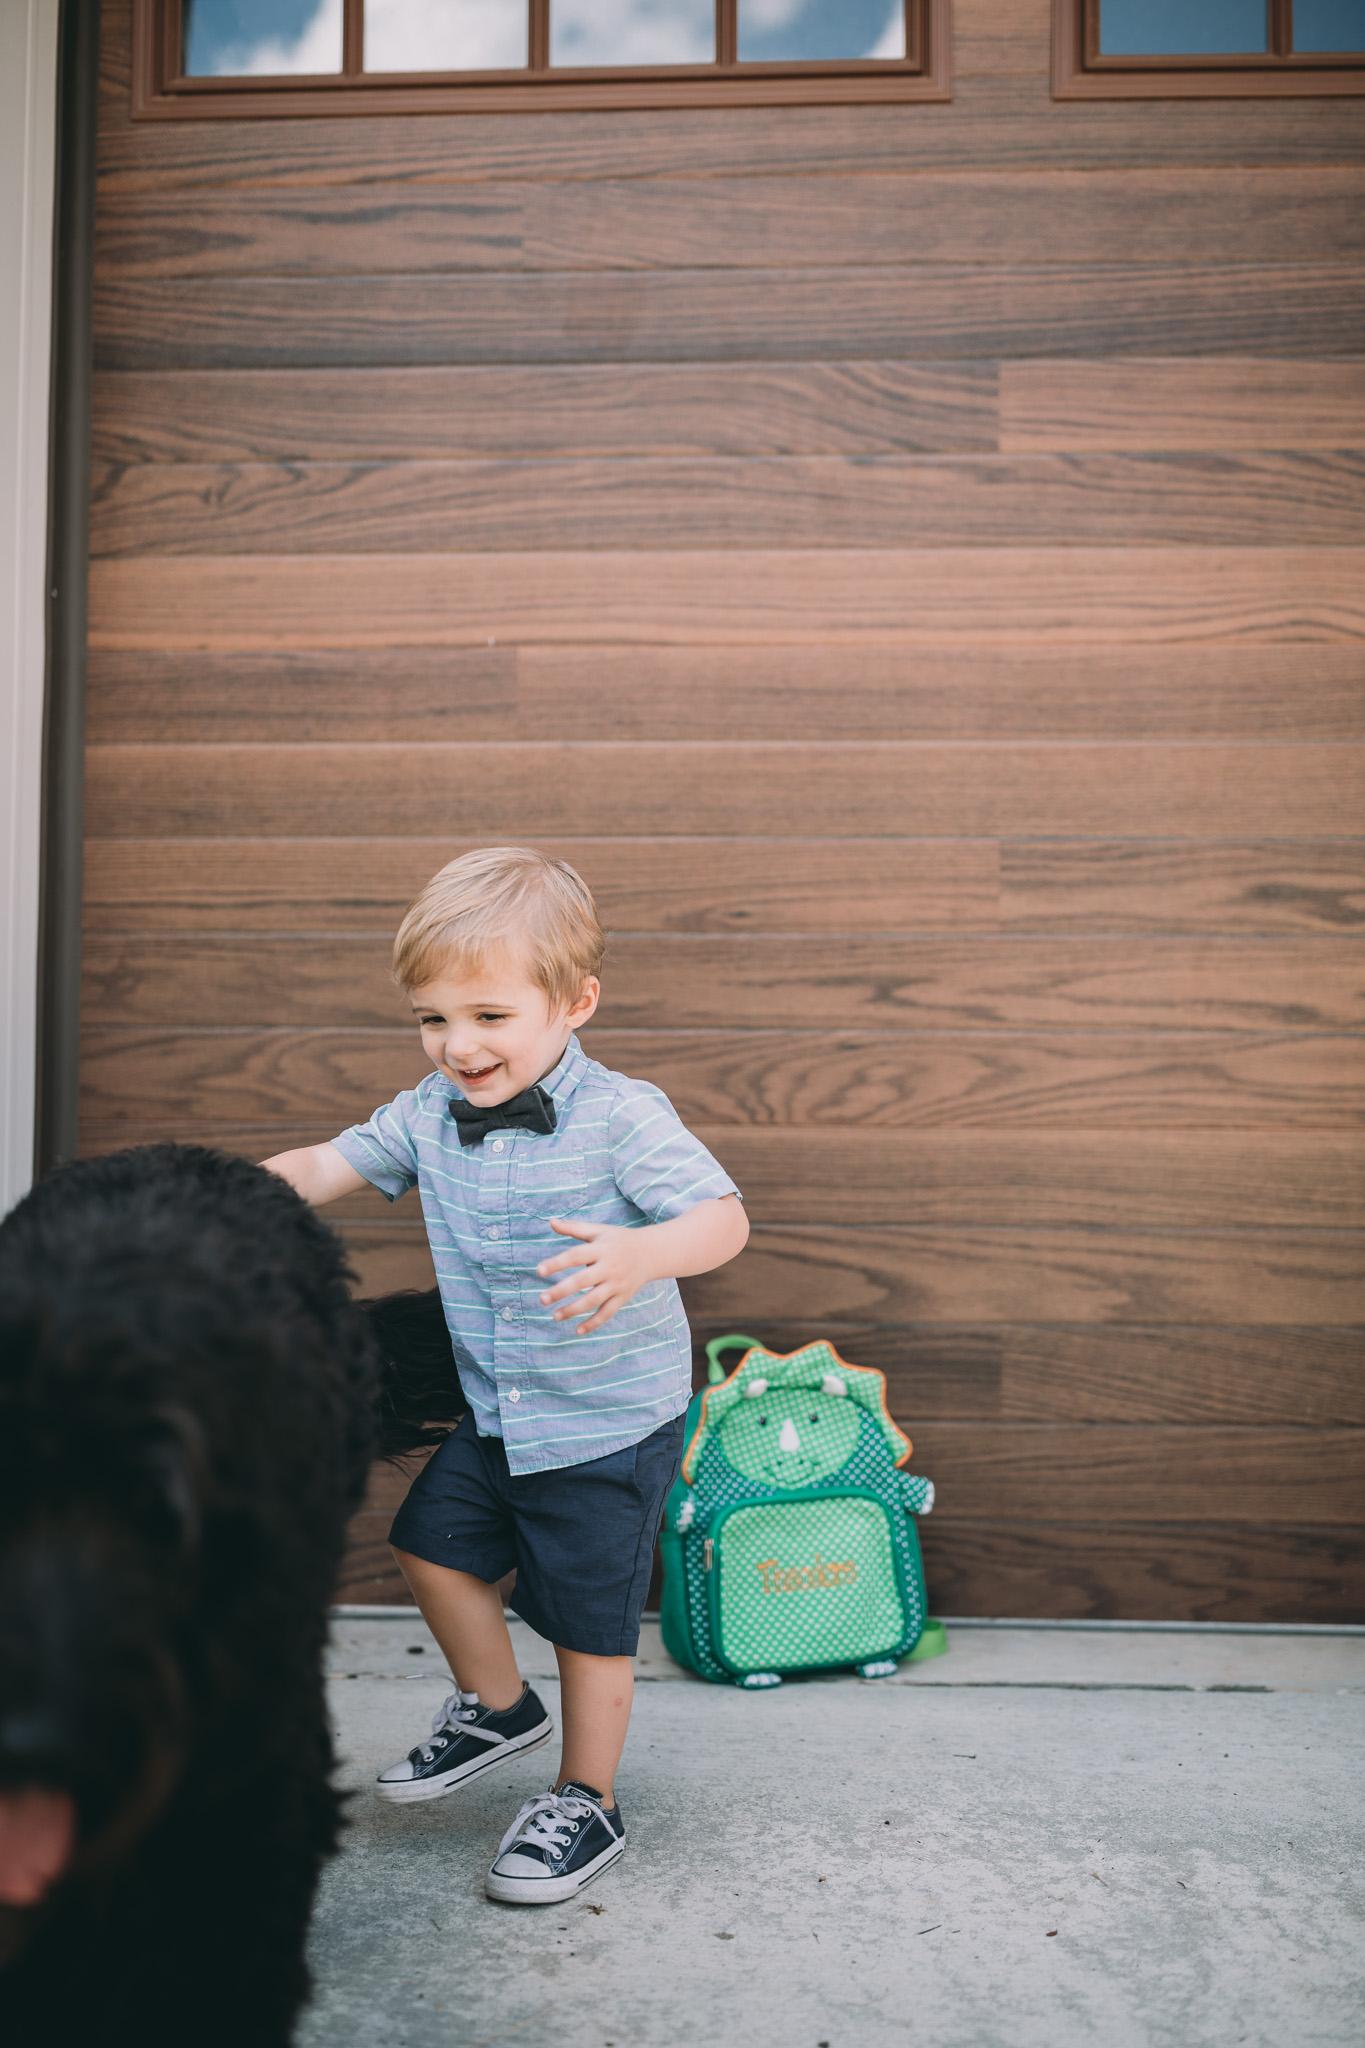 boy chasing dog